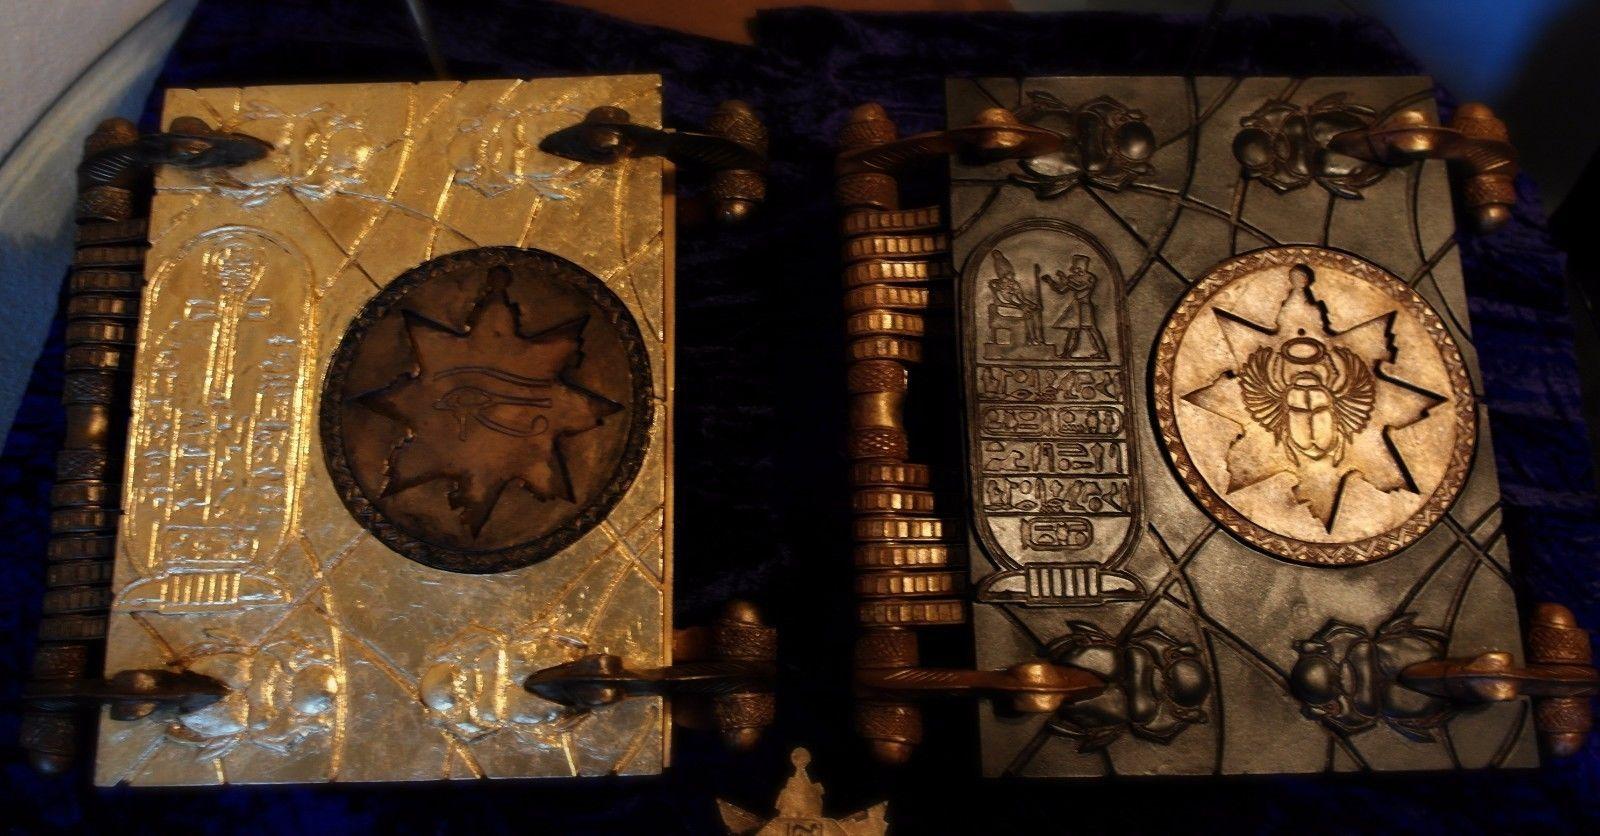 book of dead vs book of ra